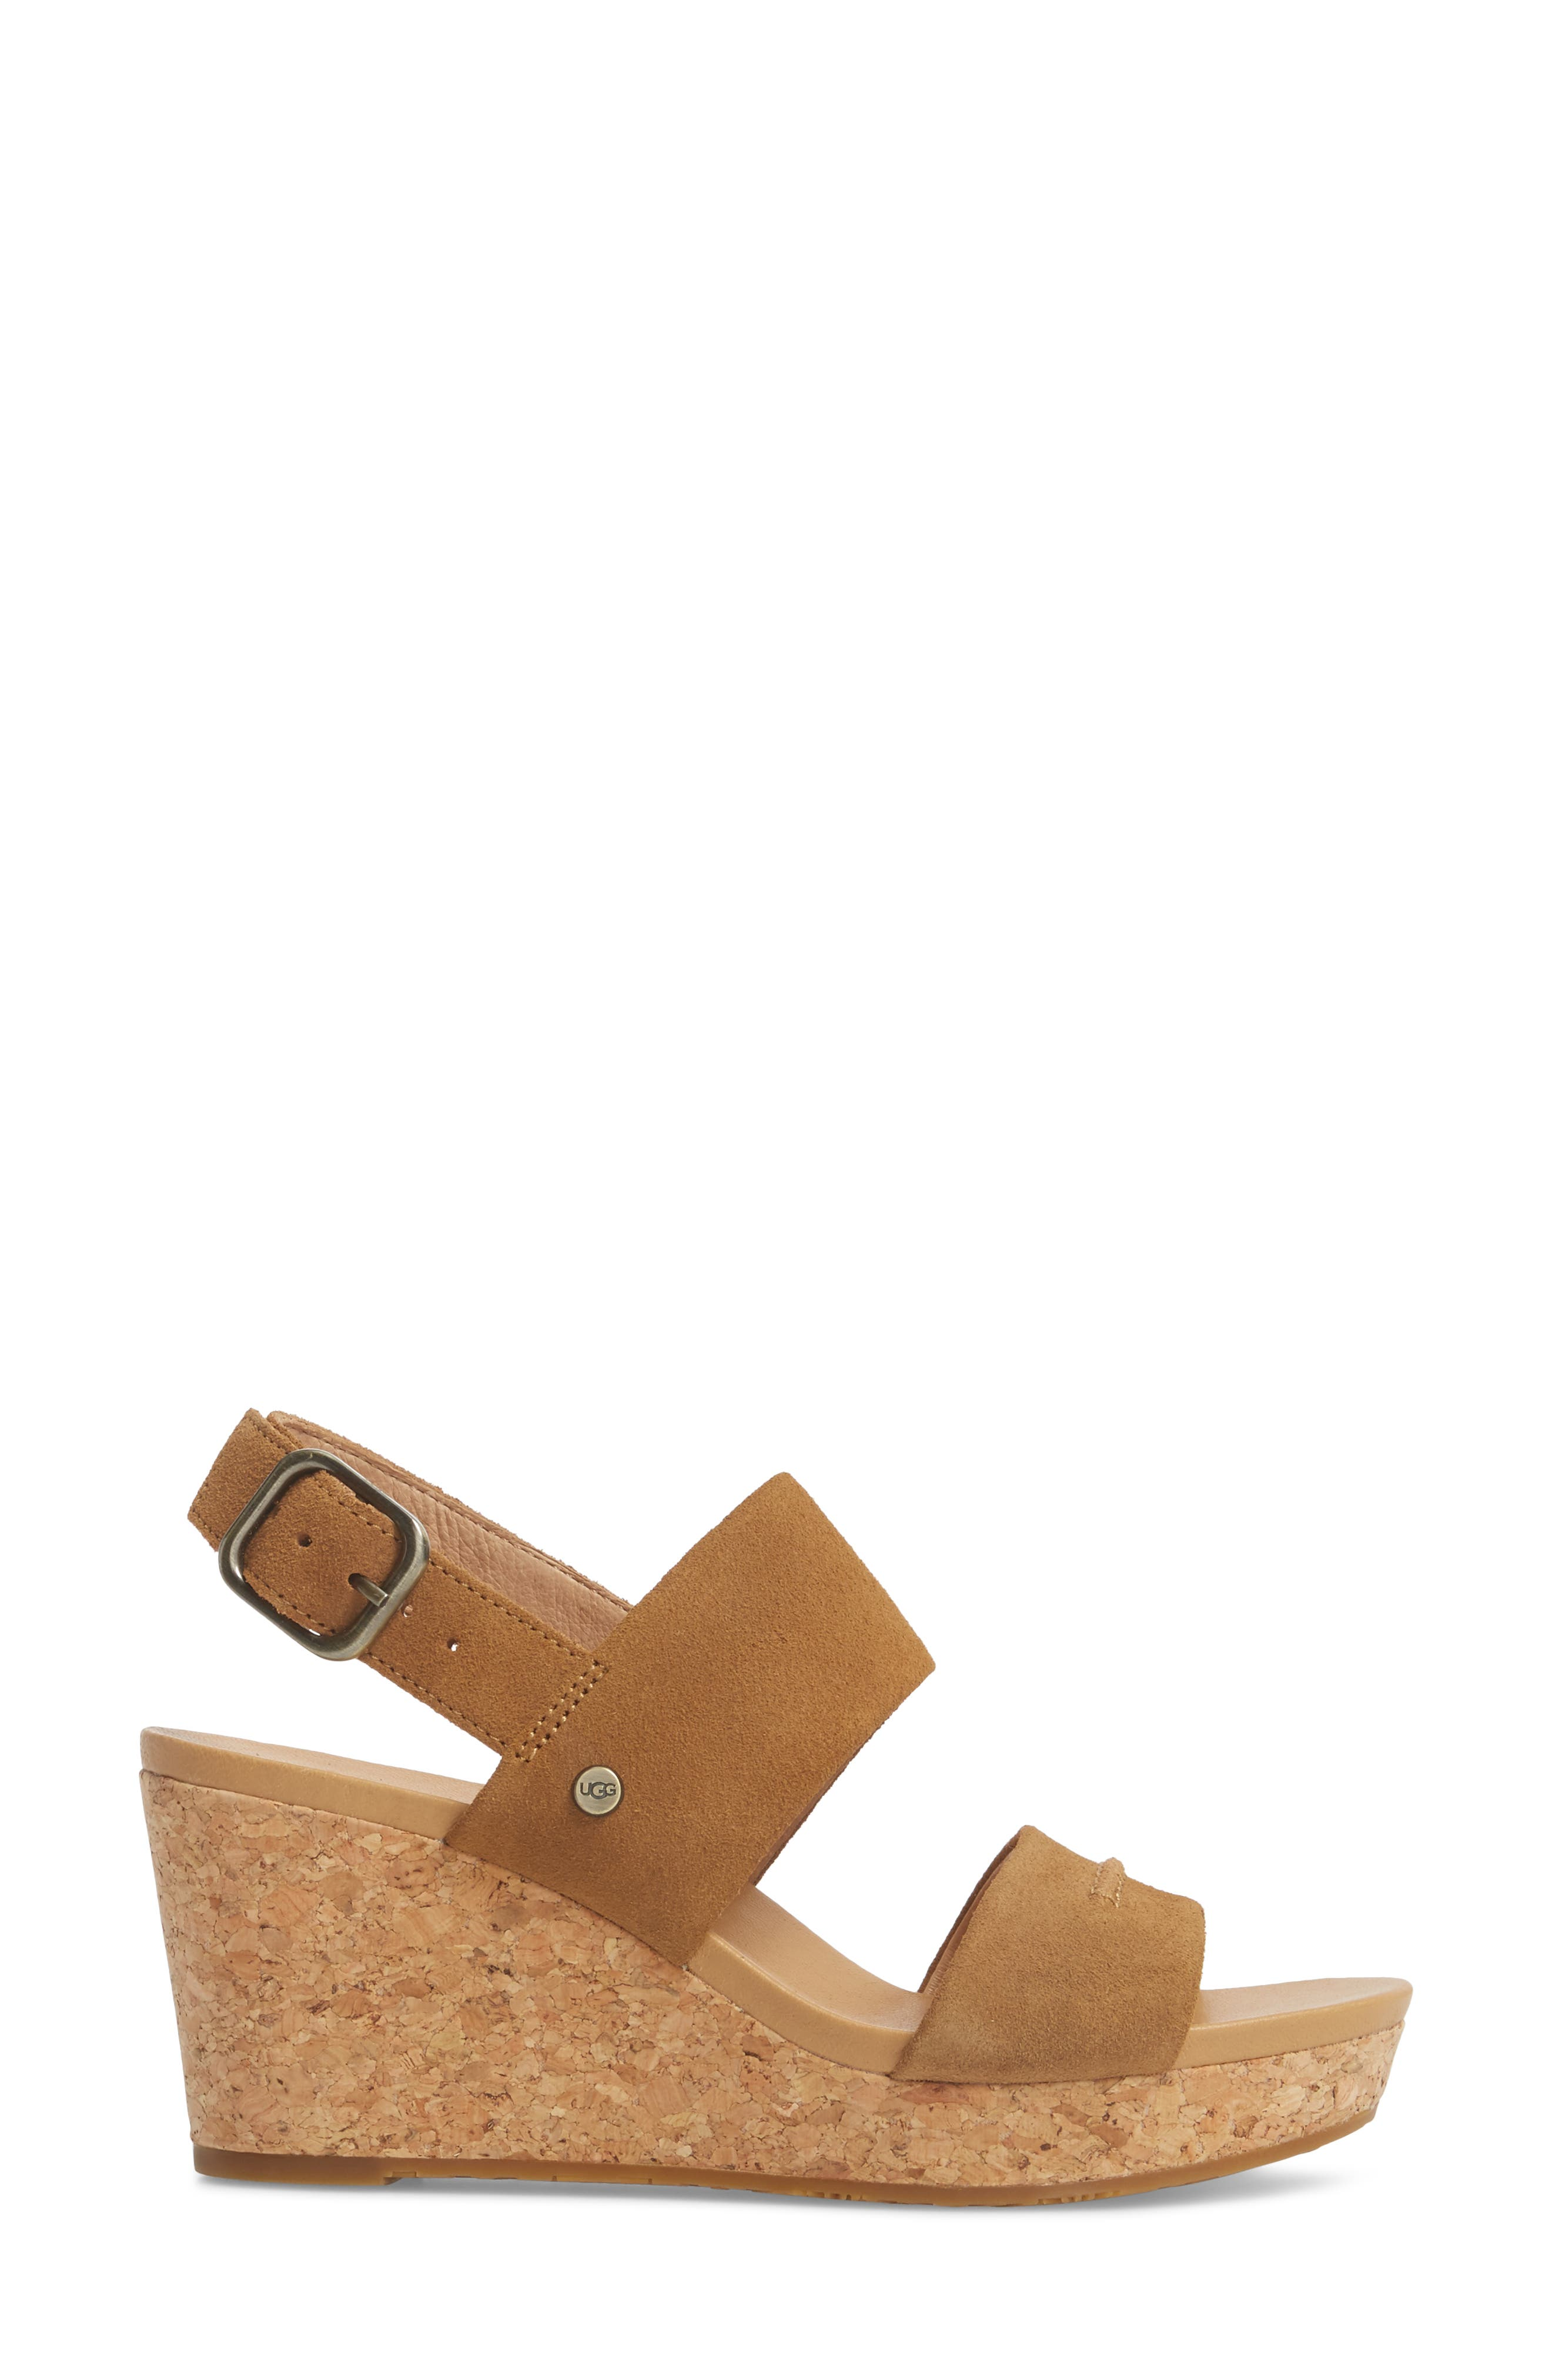 Elena II Platform Wedge Sandal,                             Alternate thumbnail 8, color,